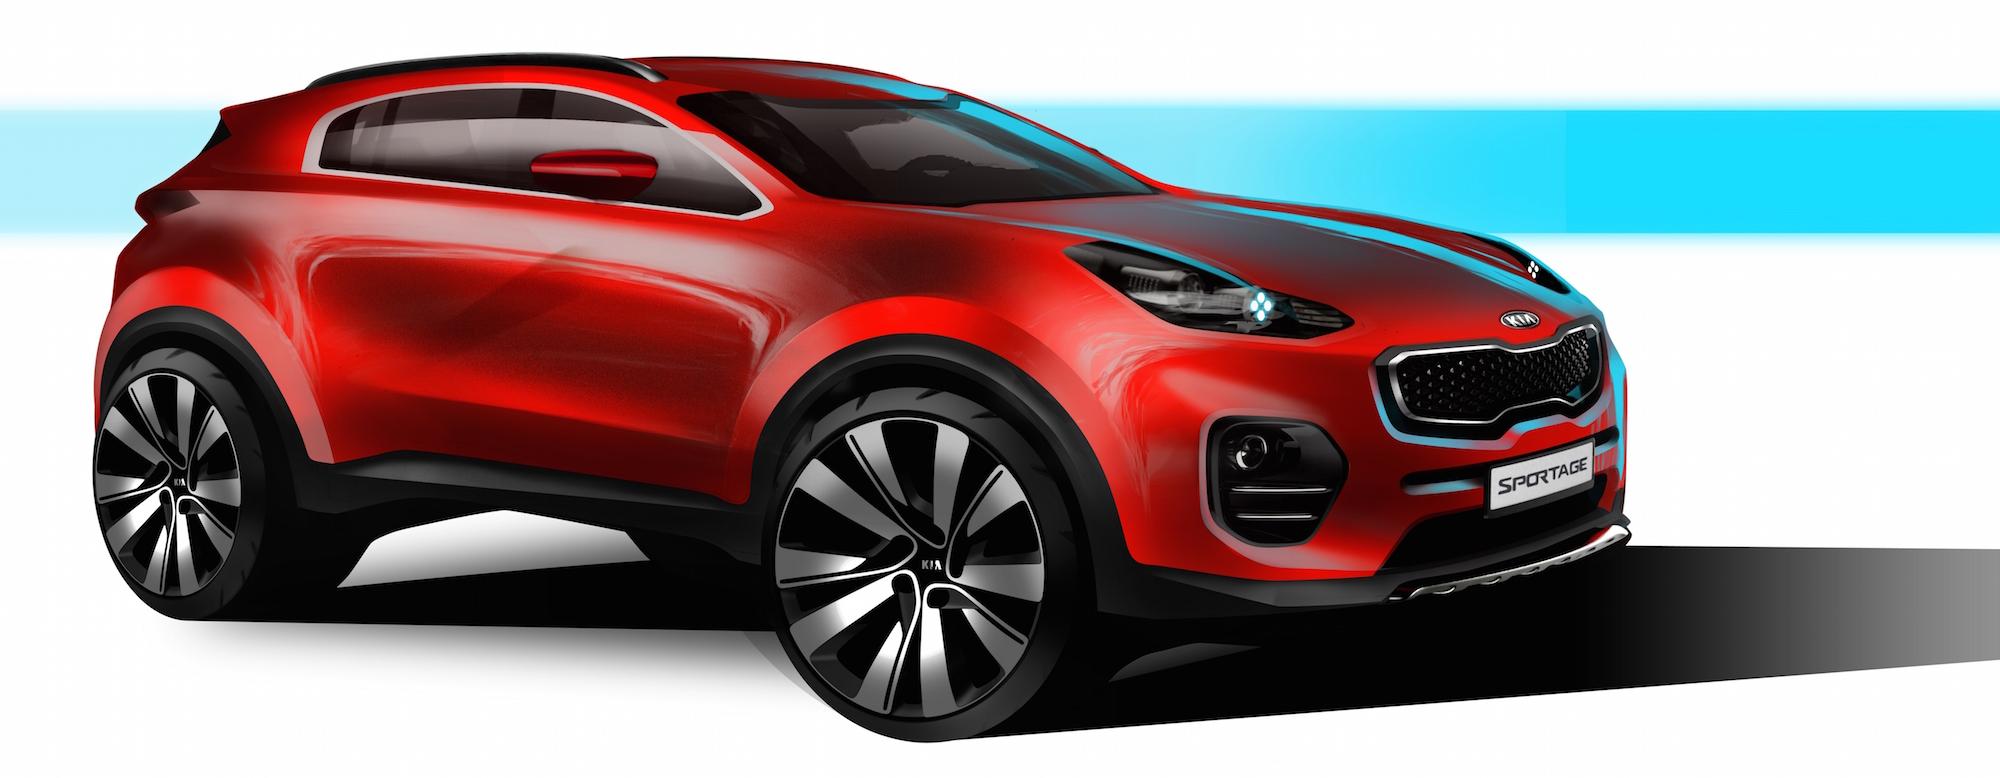 Kia Reveals Sportage Concept Drawings Ahead of Frankfurt Debut